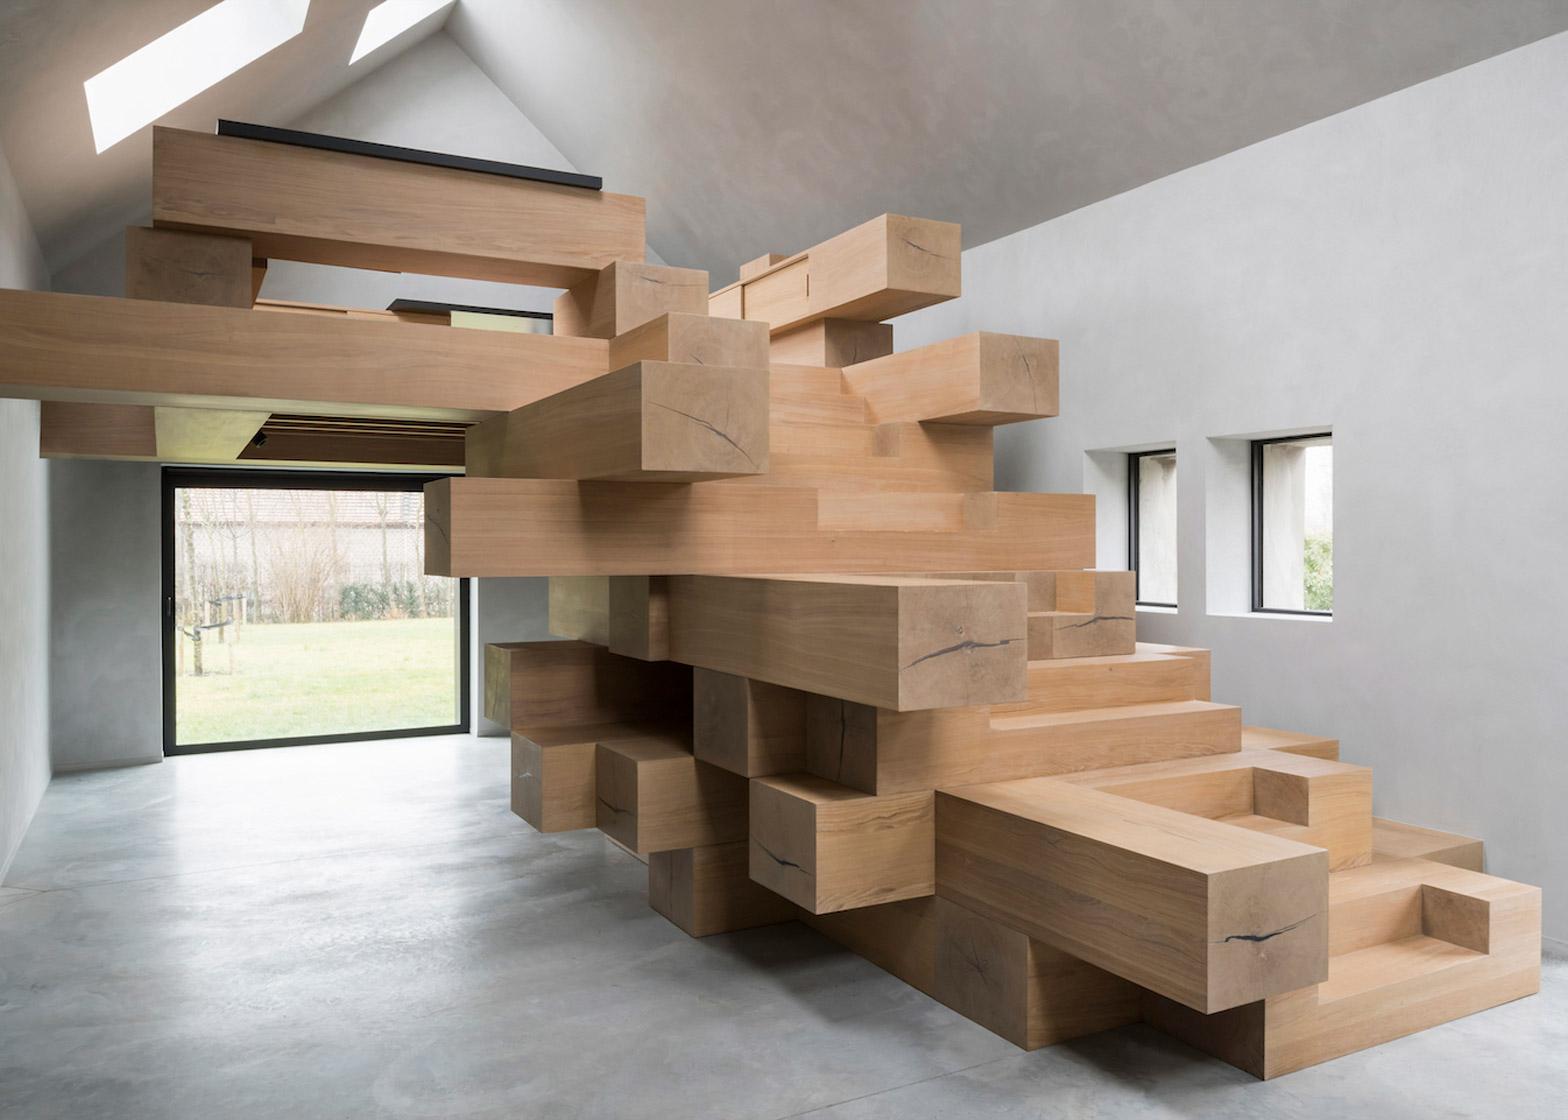 architecture_wood_office_design_studia_interiors_osnovadesign_osnova_poltava_06